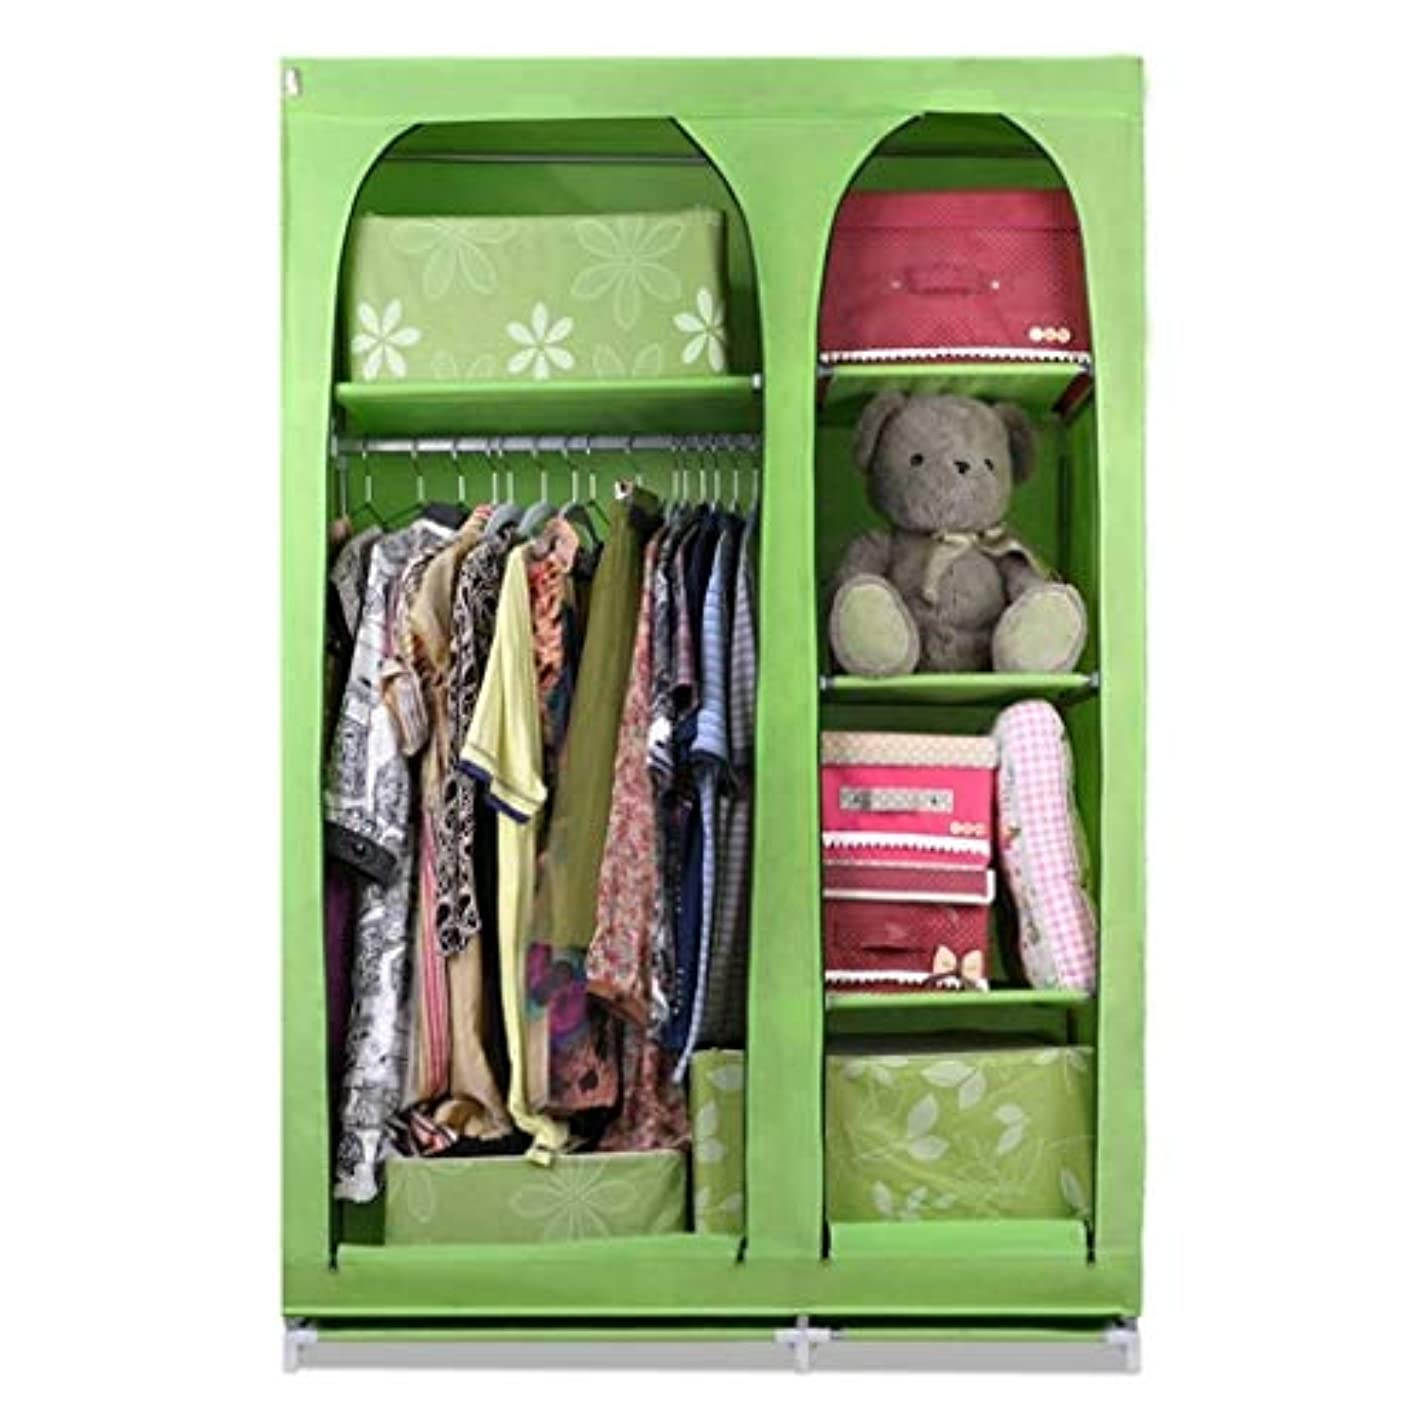 TYUIO Portable Closet Storage Organizer Clothes Wardrobe Shoe Rack Shelves(Size: 104x44x160CM) (Color : Colour B)